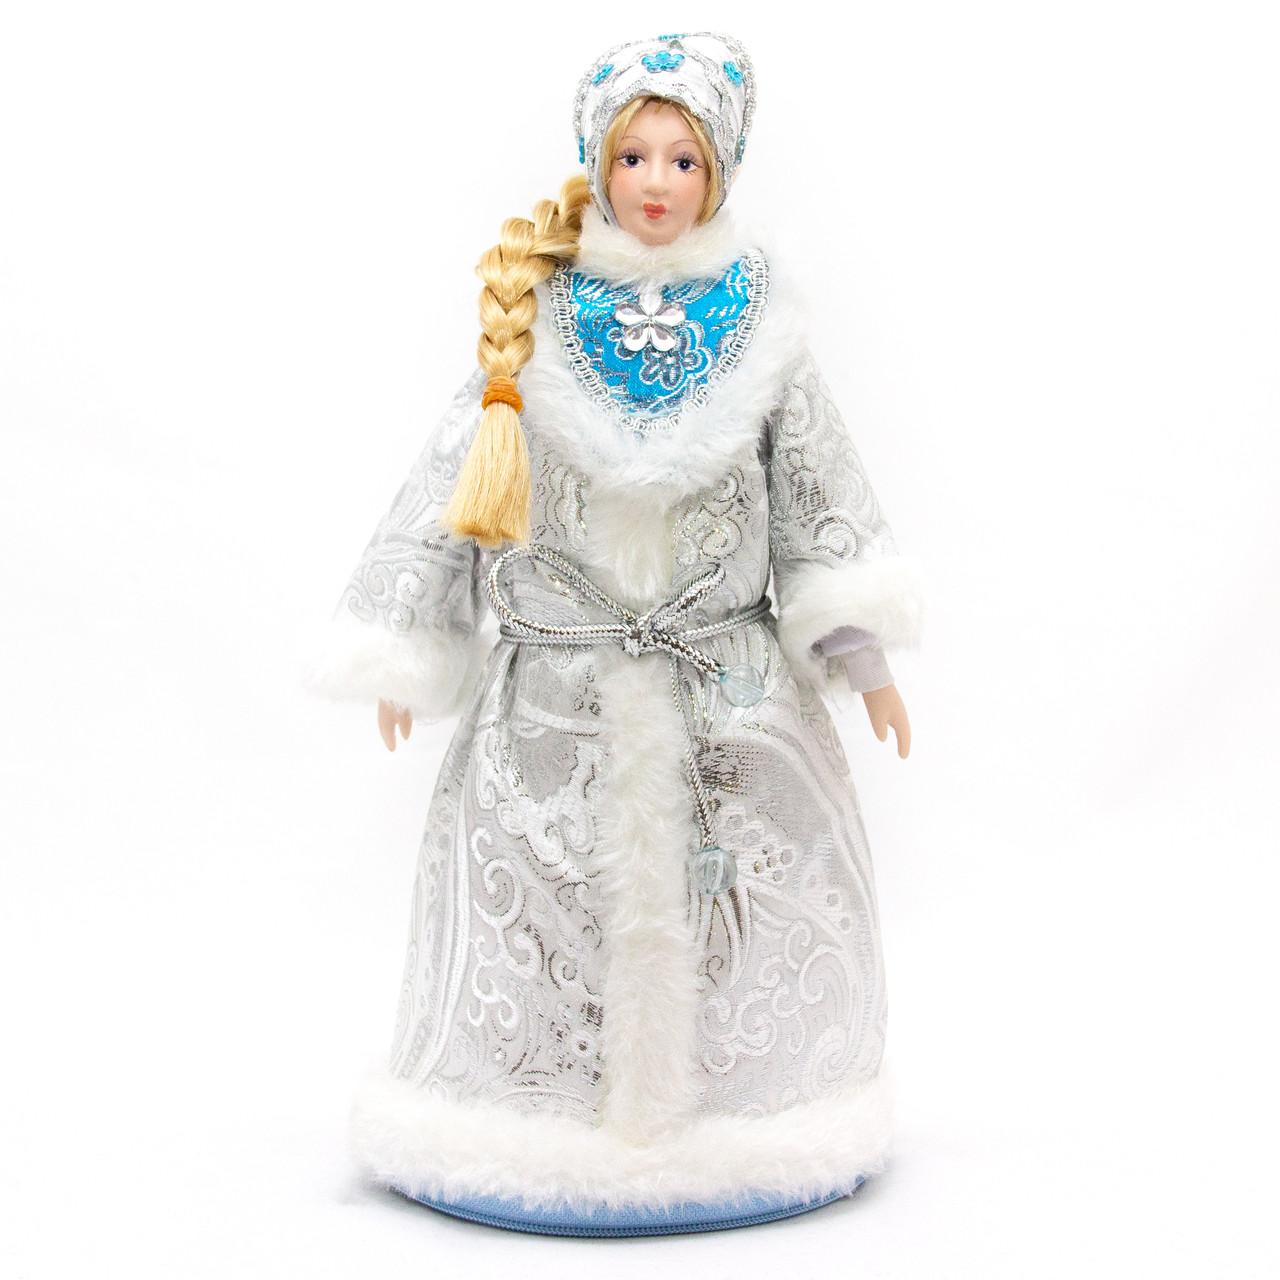 Снегурочка, 33 см, серебристый, пластик, полиэстер (180479-5)